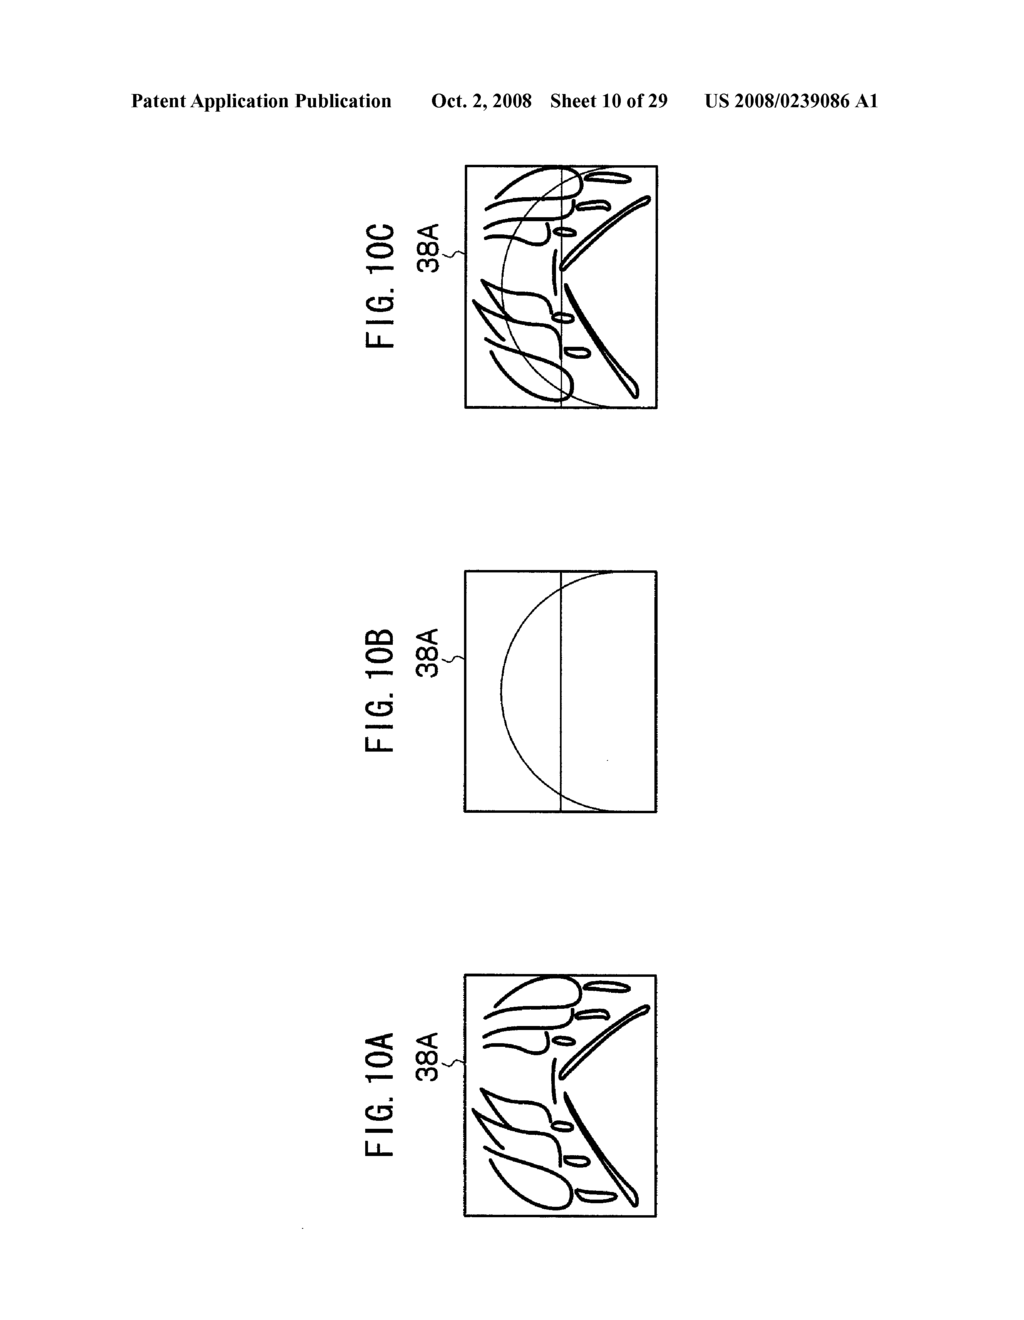 hight resolution of digital camera digital camera control process and storage medium storing control program diagram schematic and image 11